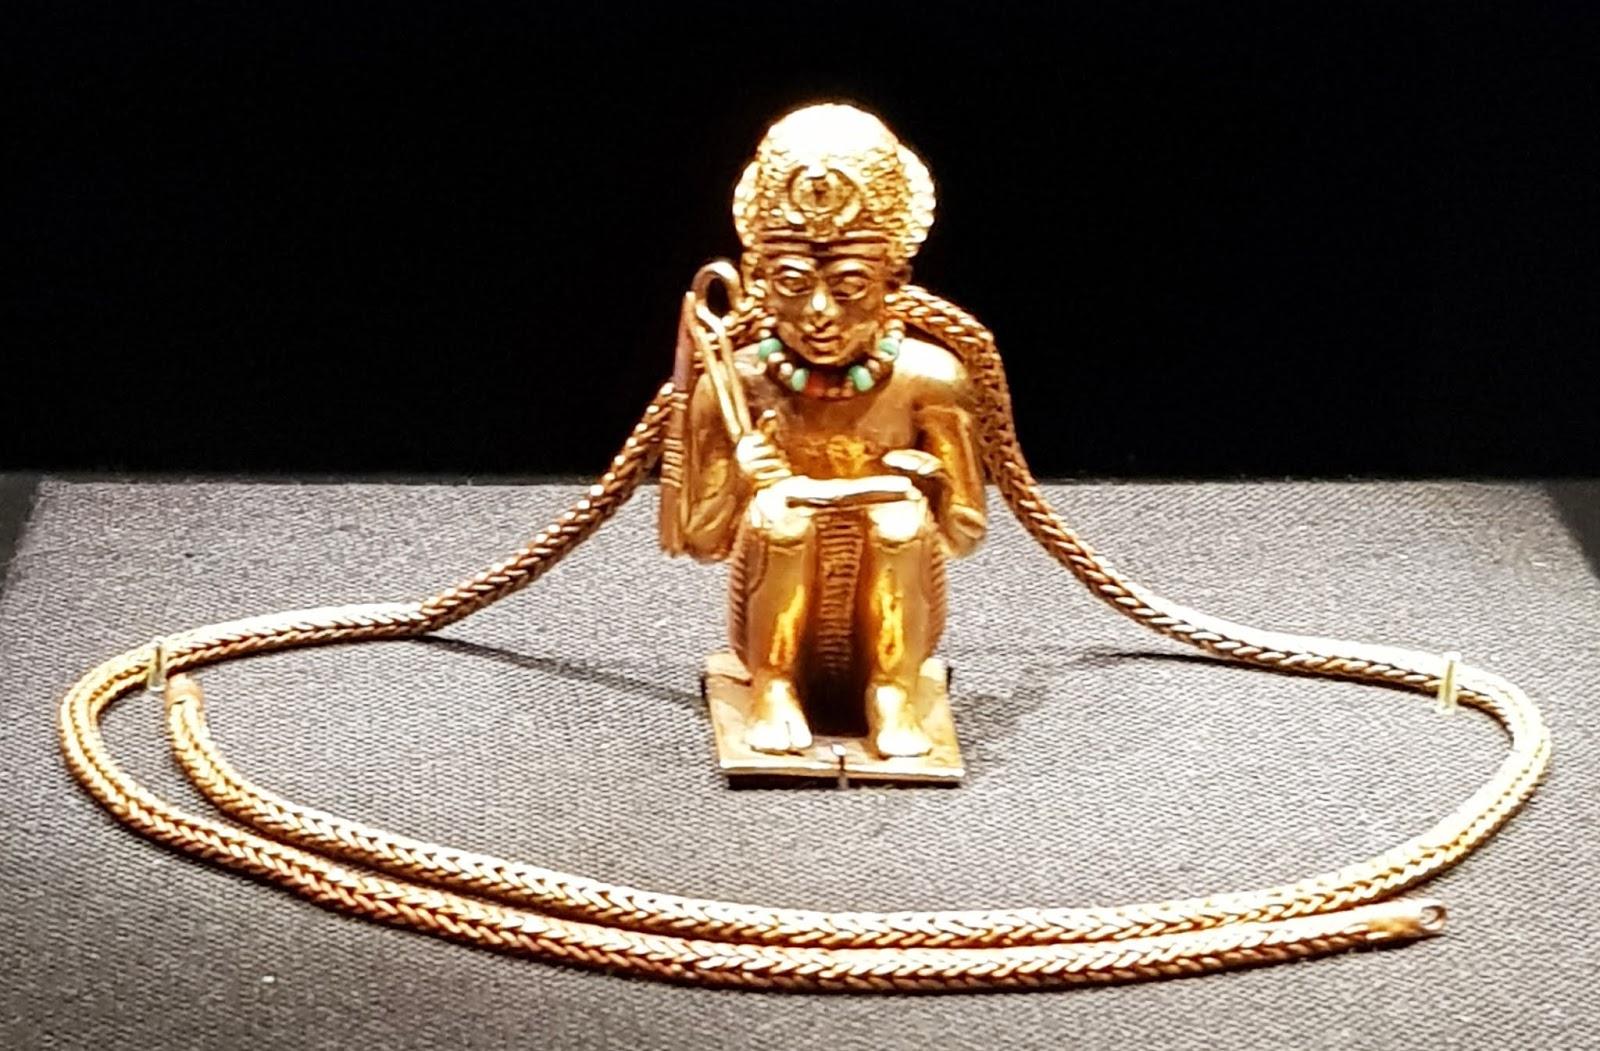 Amulet of Amenhotep III at the Tutankhamun Exhibition in London